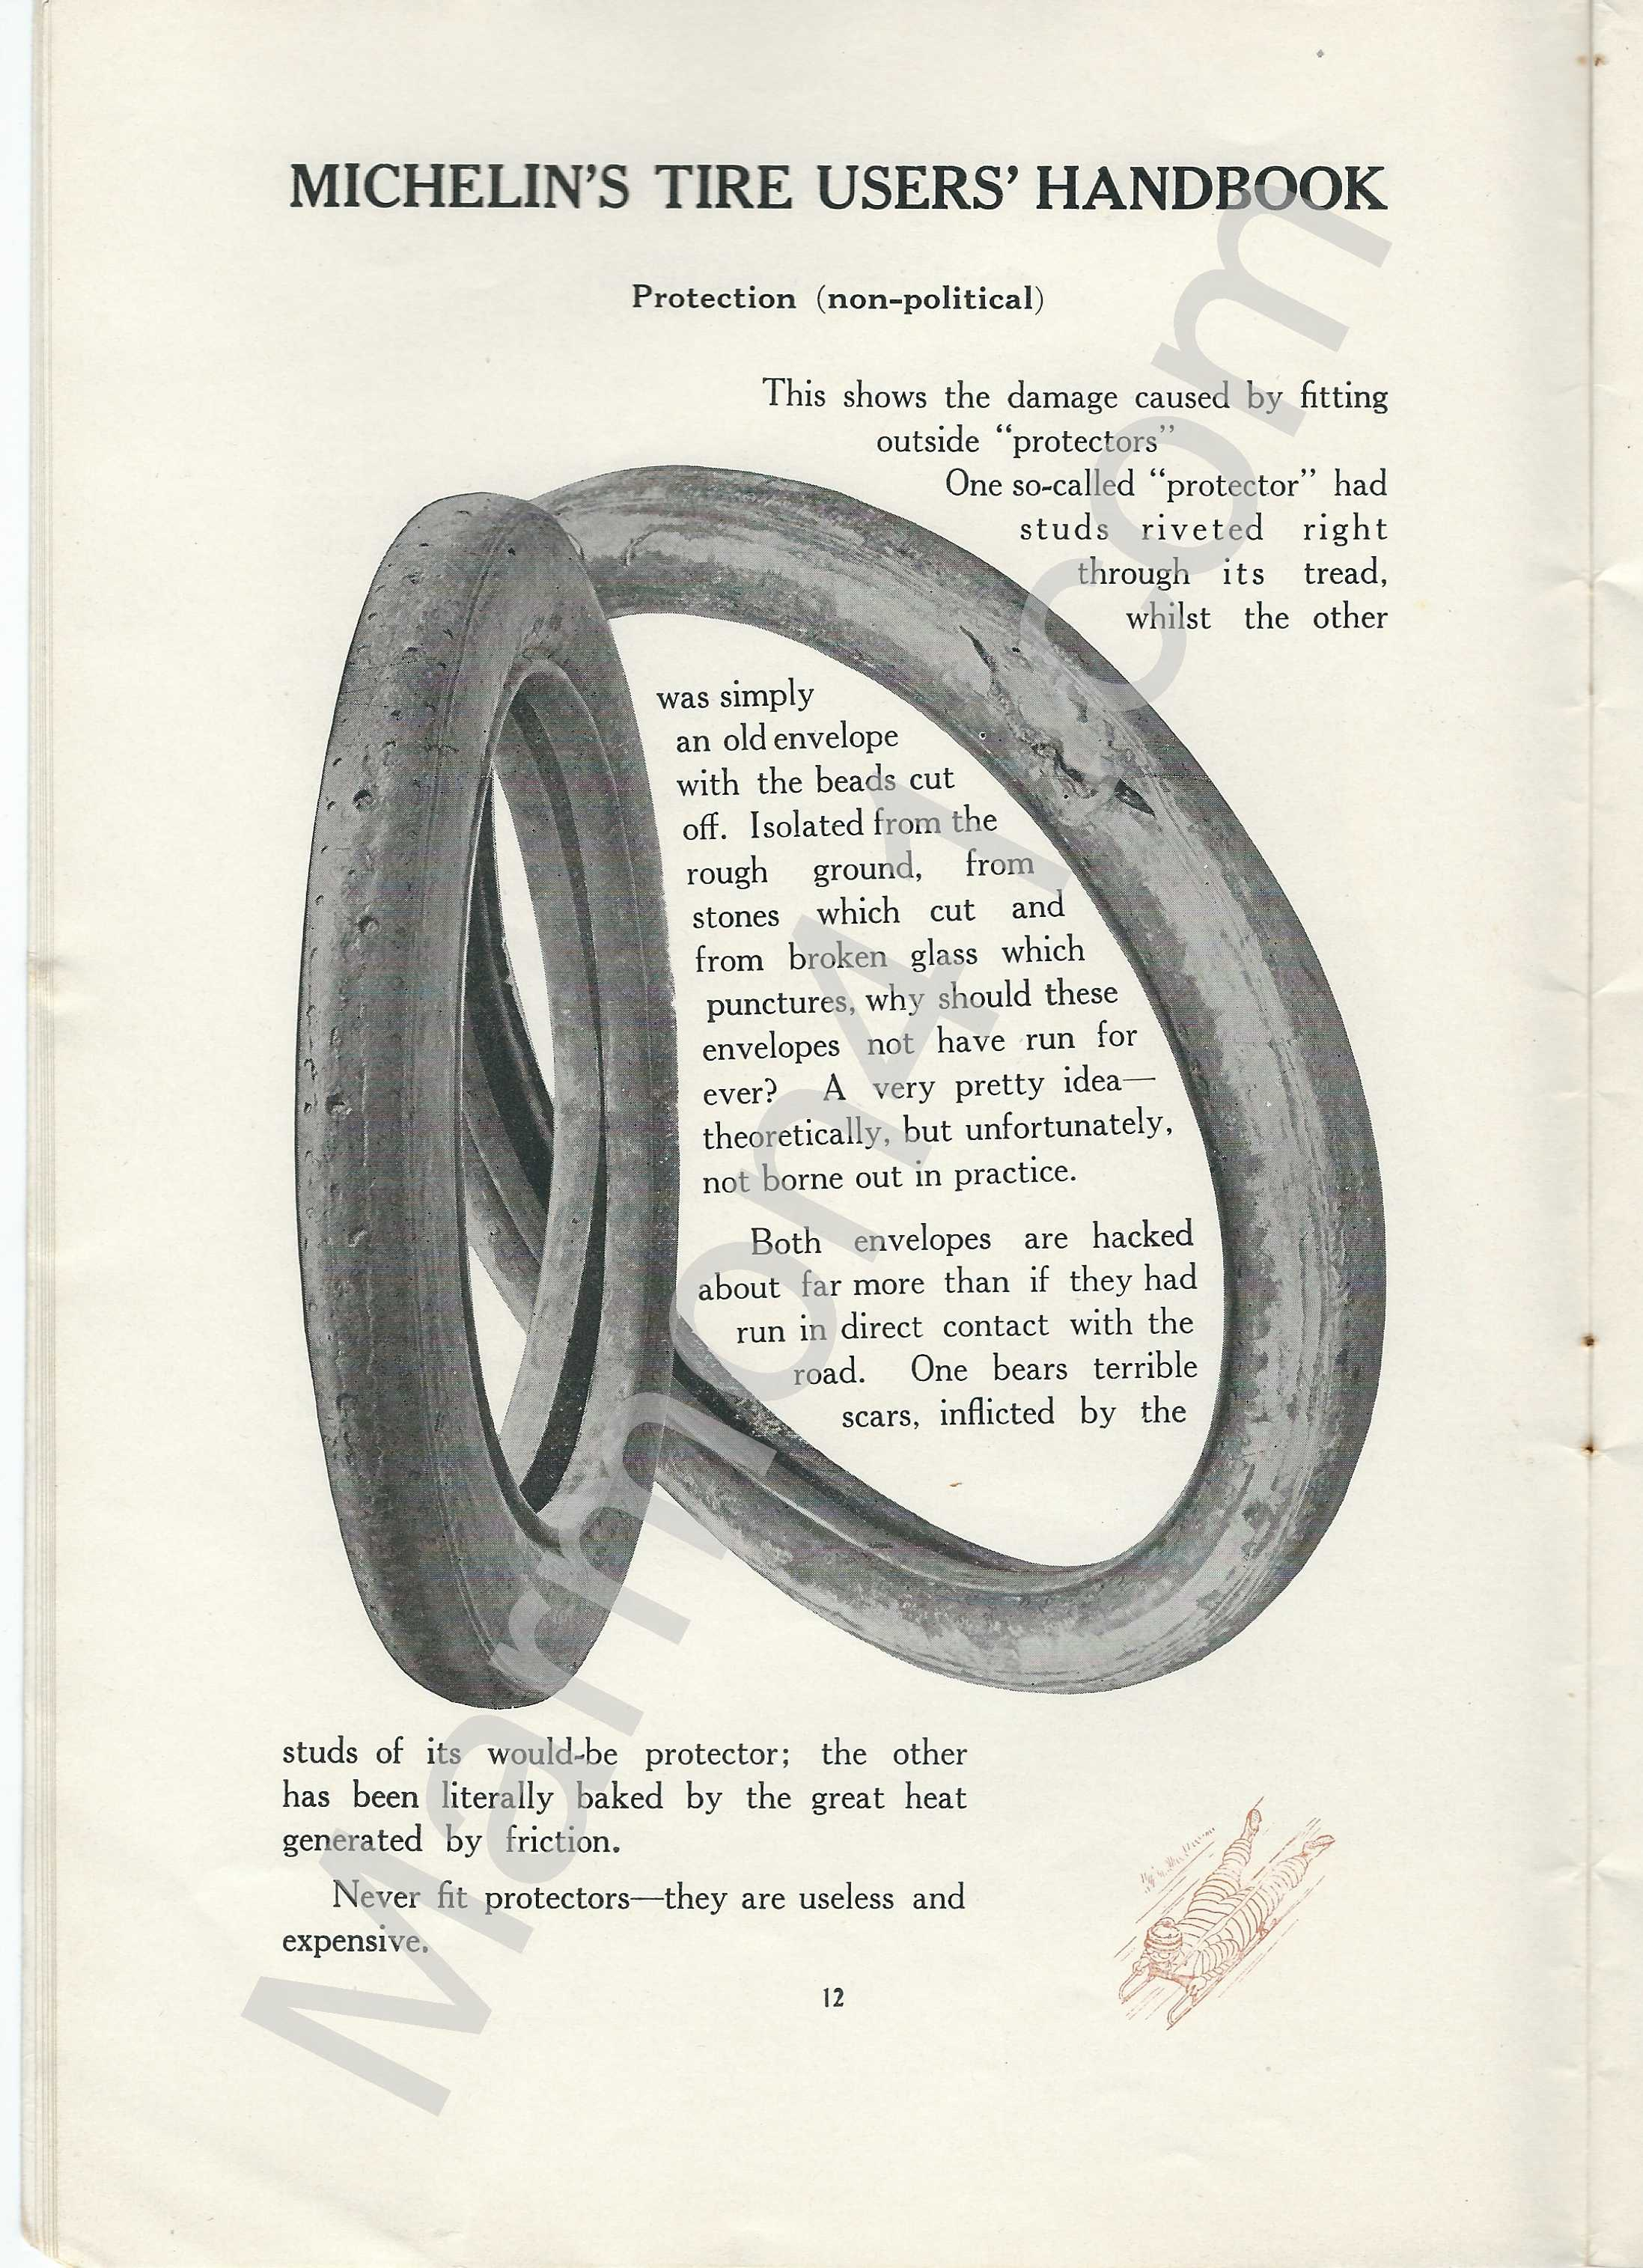 Michelins Tire Users Handbook_13